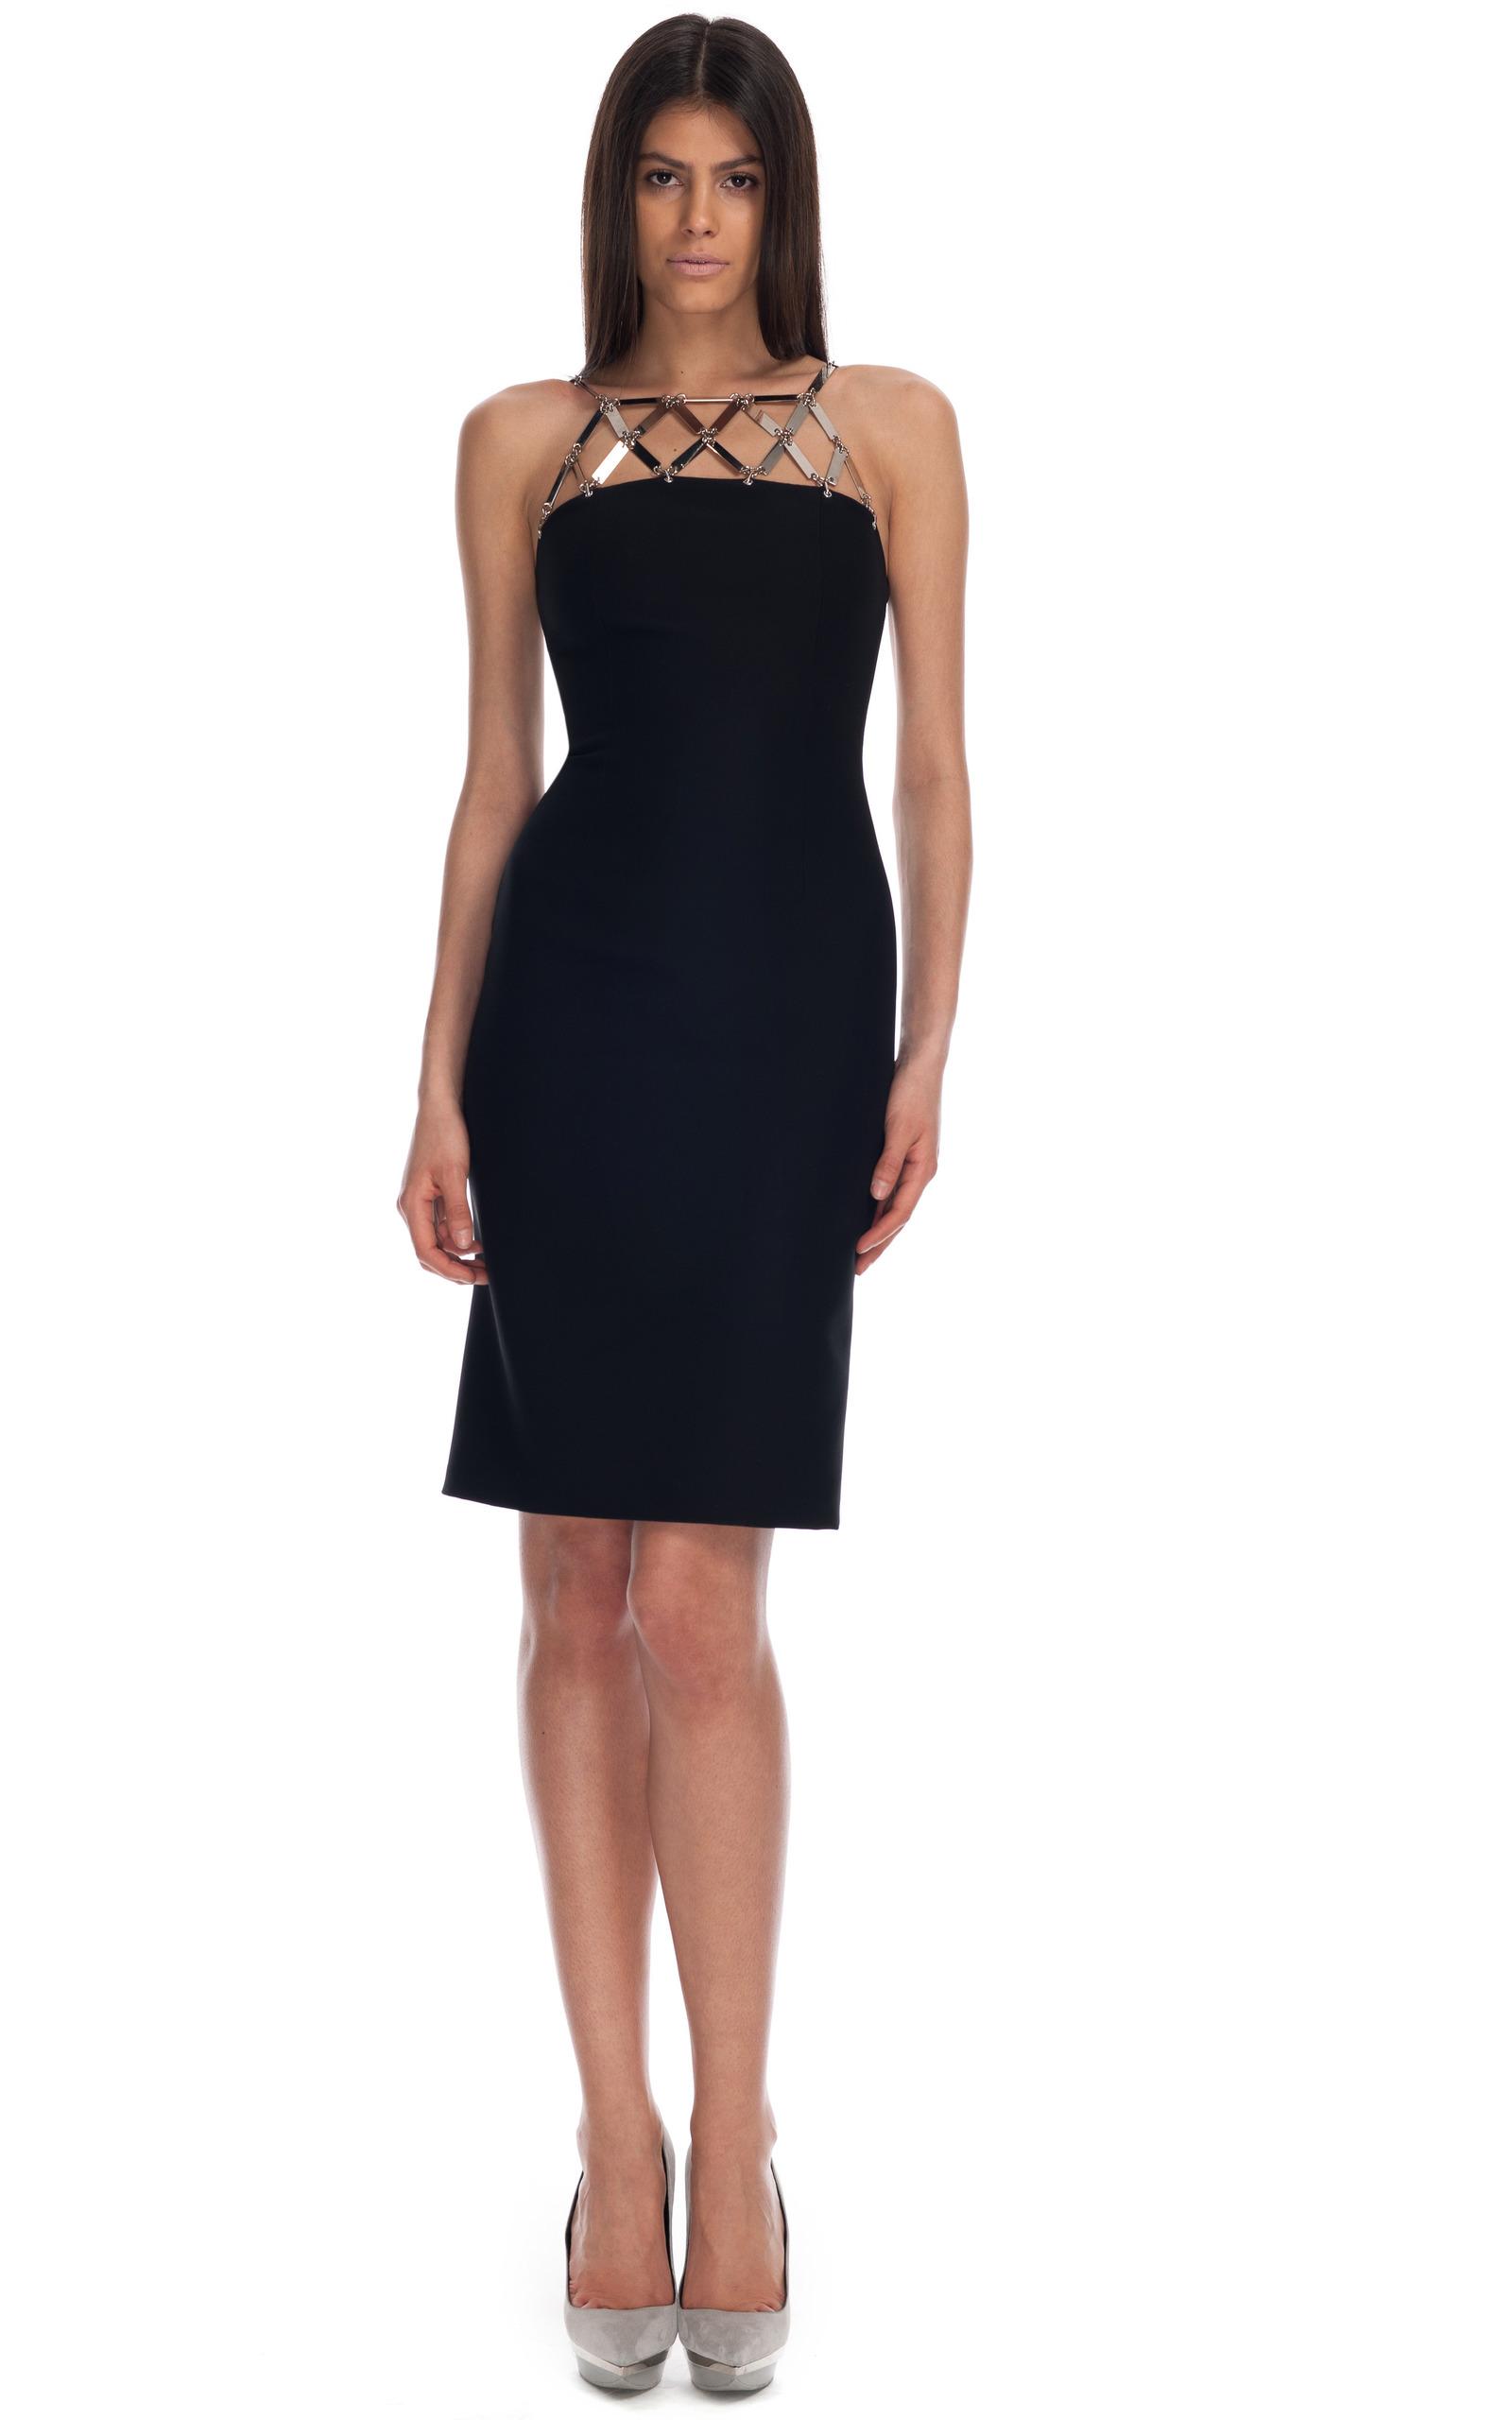 Donatella Versace Buckle Dress